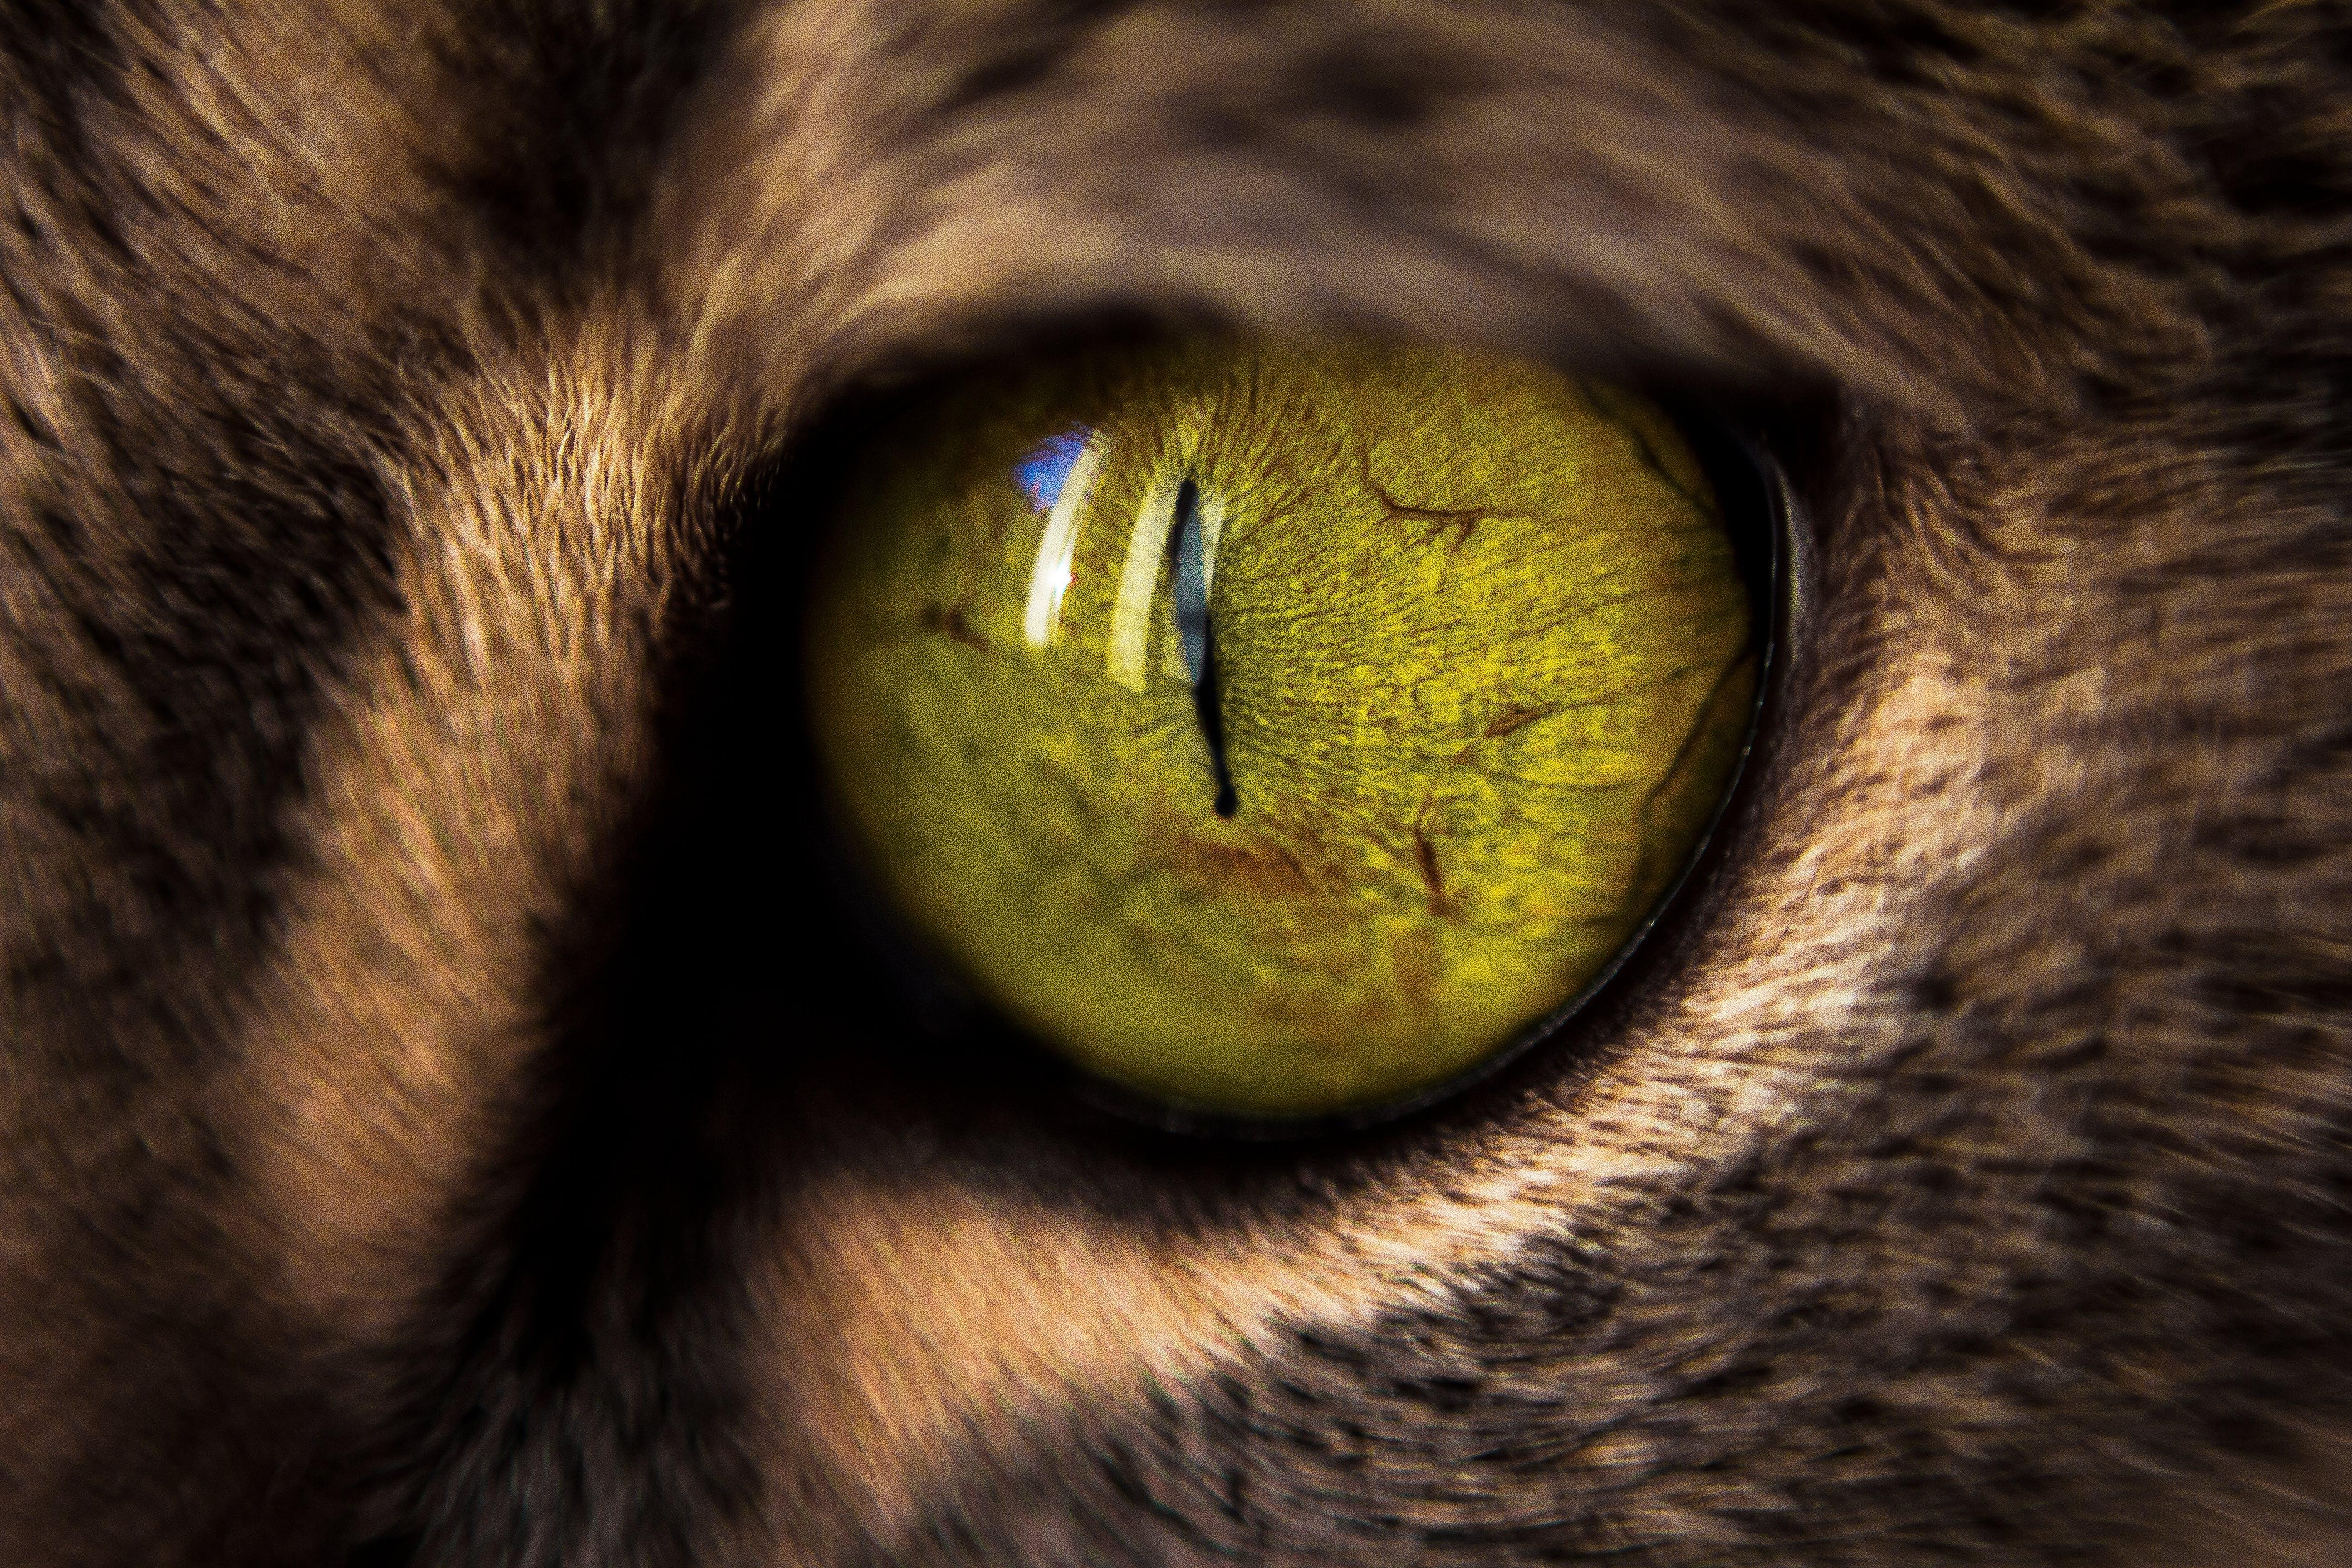 Macro Photography of Green Cat's Eye